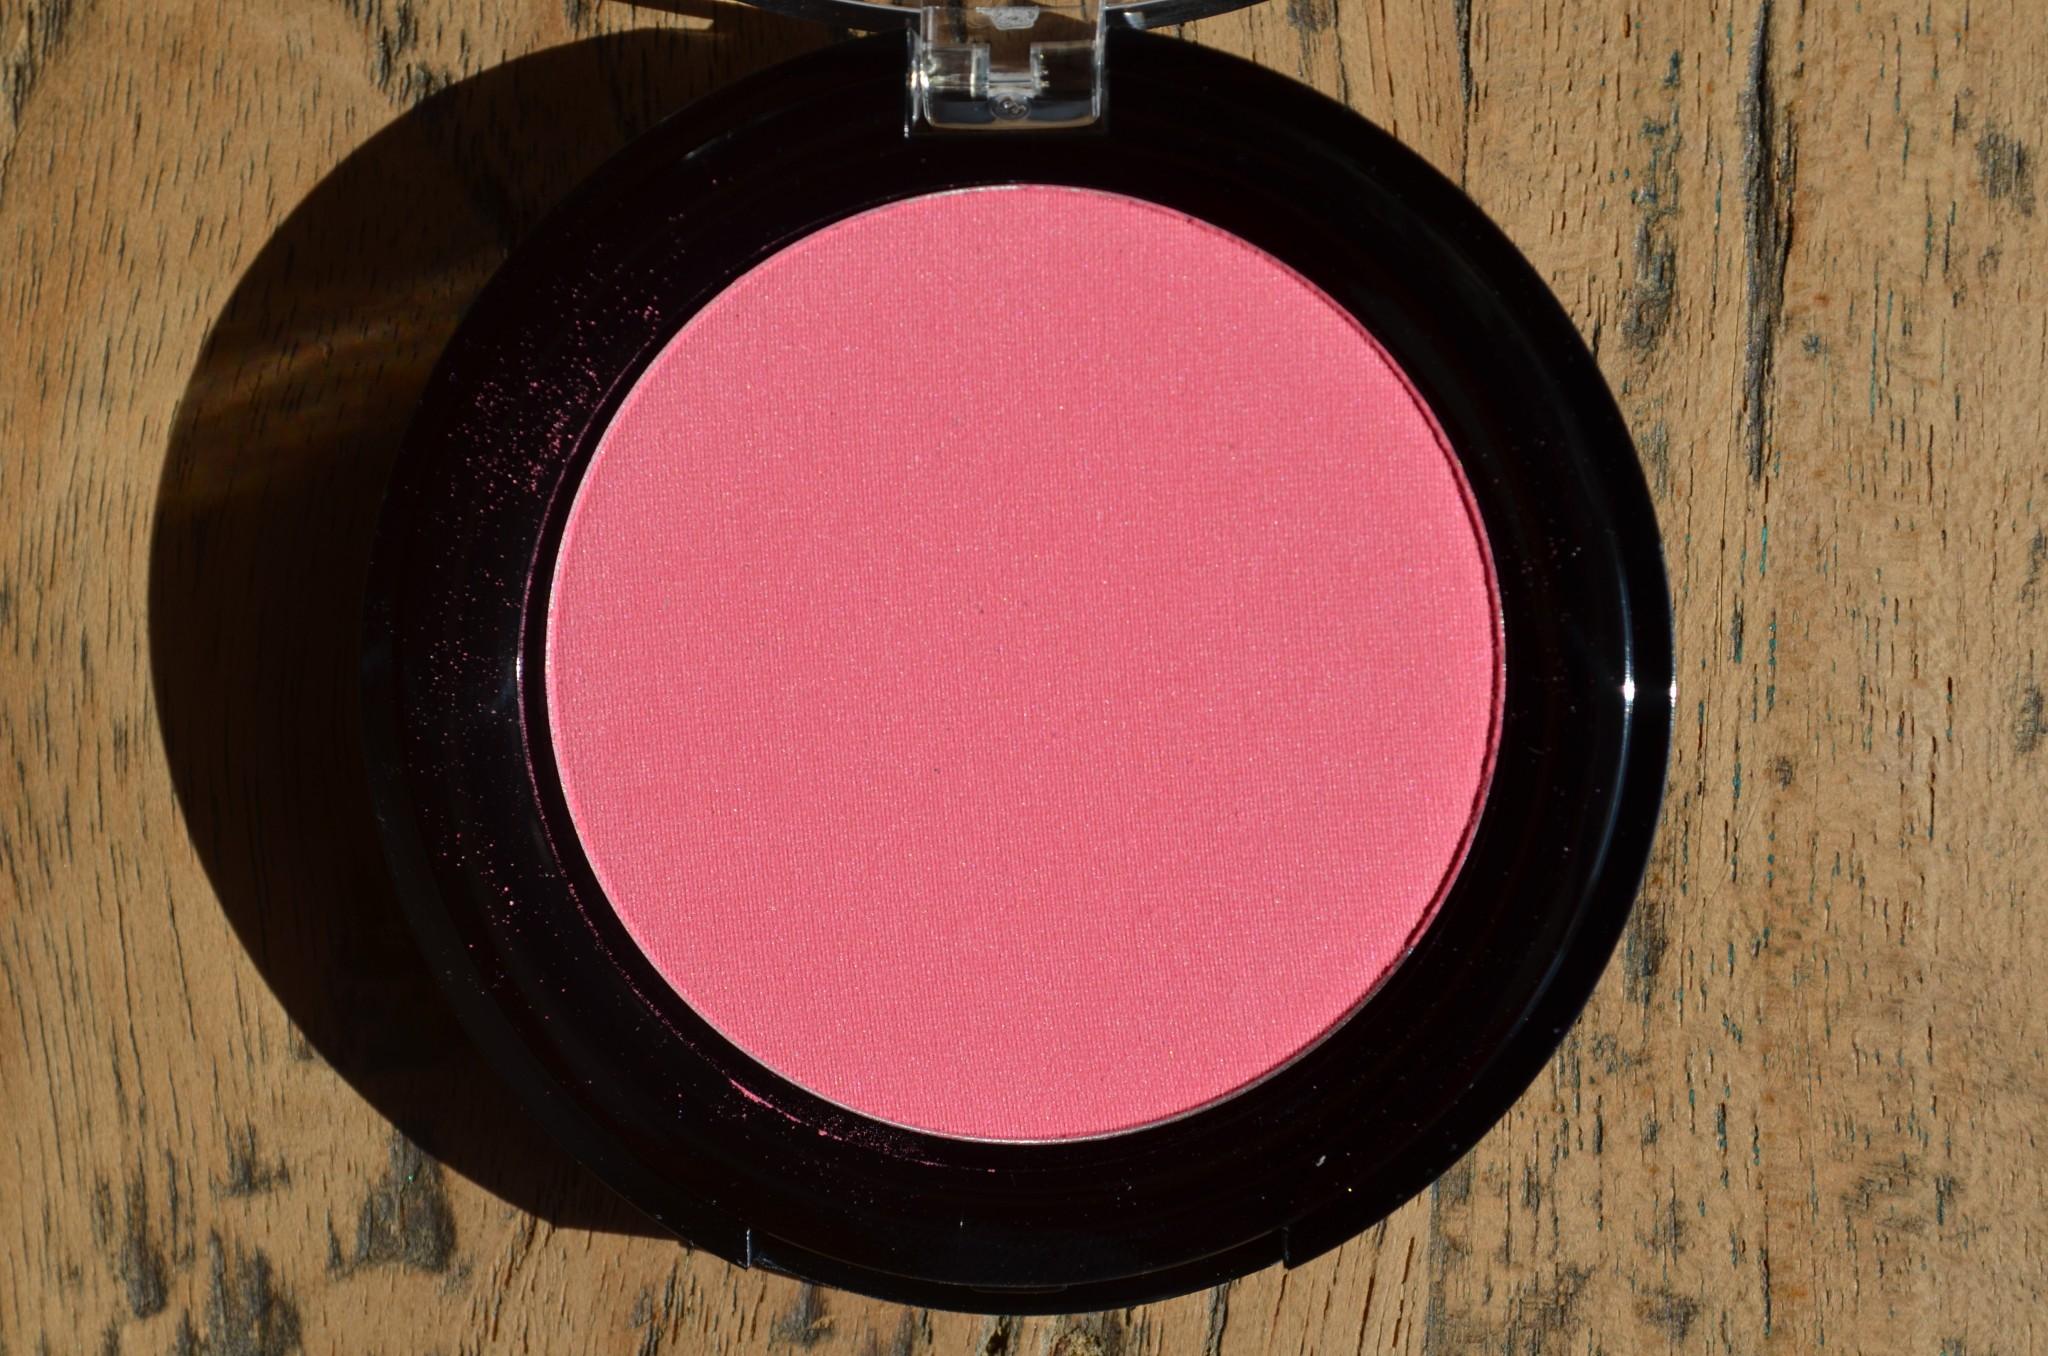 DSC 02101 - Nieuw van Hema! Satin Blush Powder(s) Review